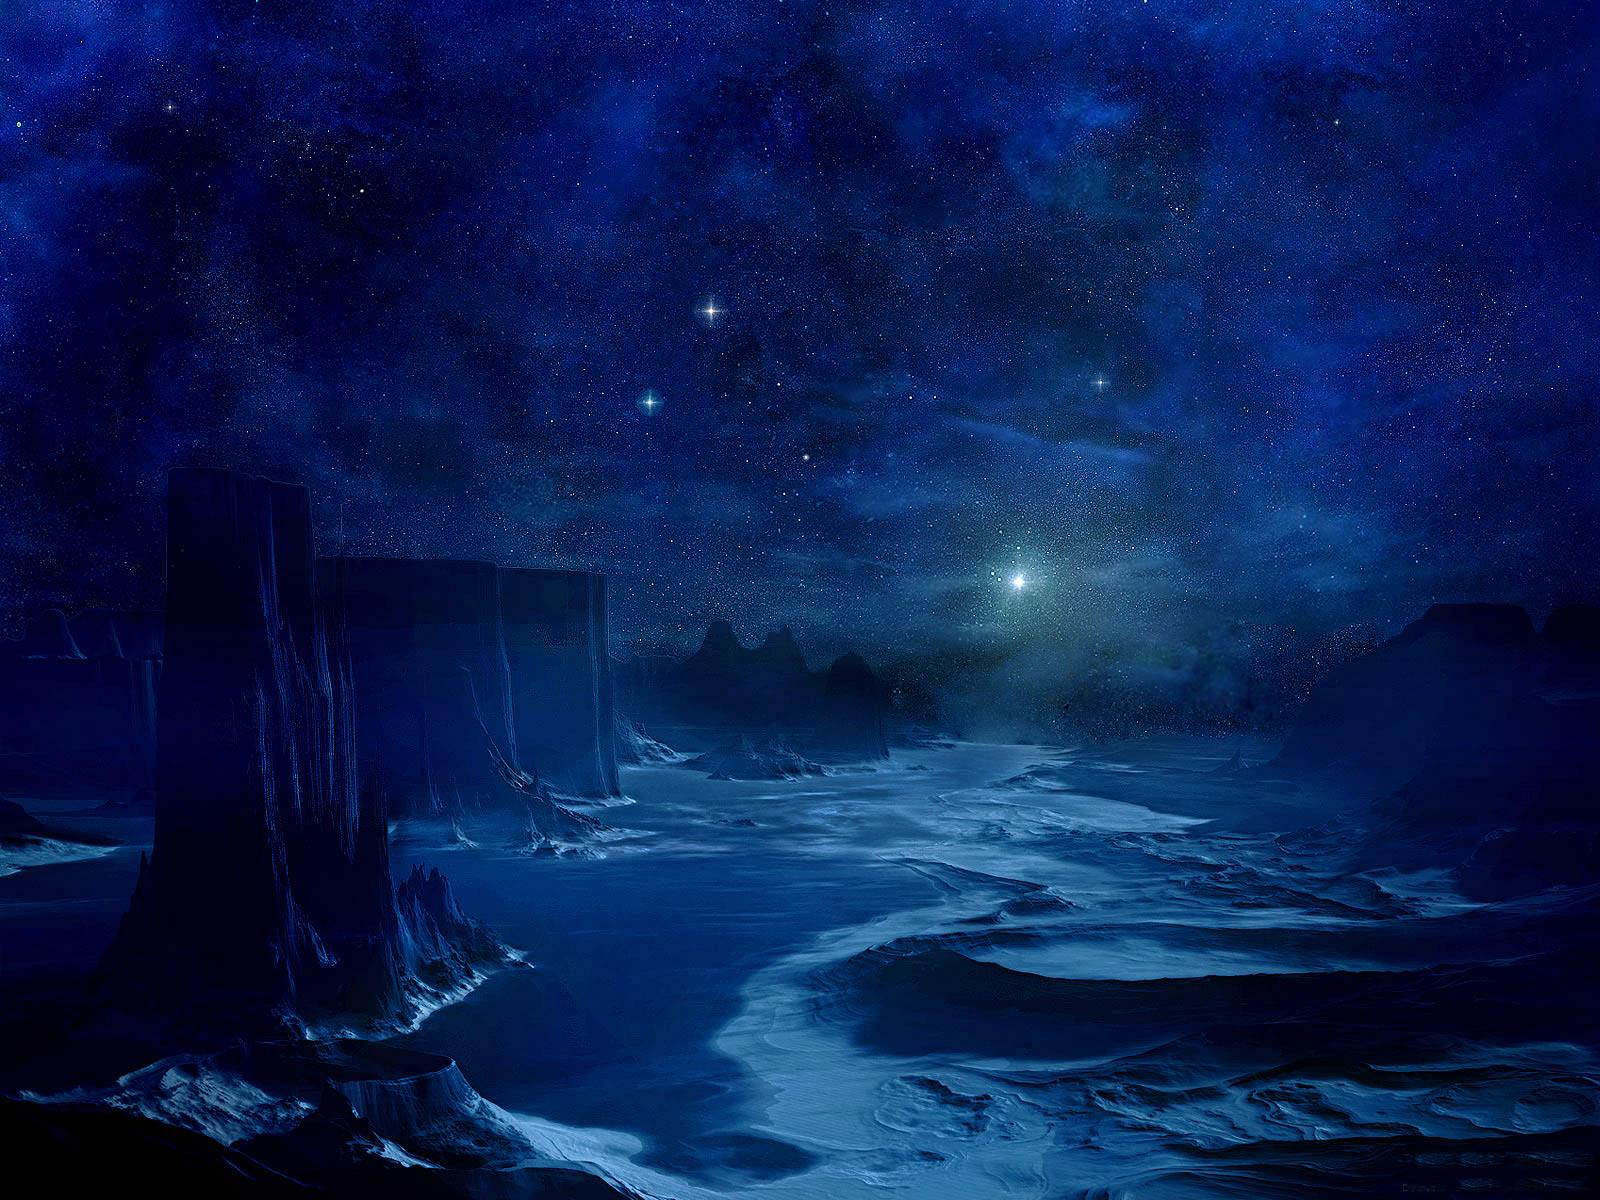 beautiful night wallpaper hd 79 Freetopwallpapercom 1600x1200